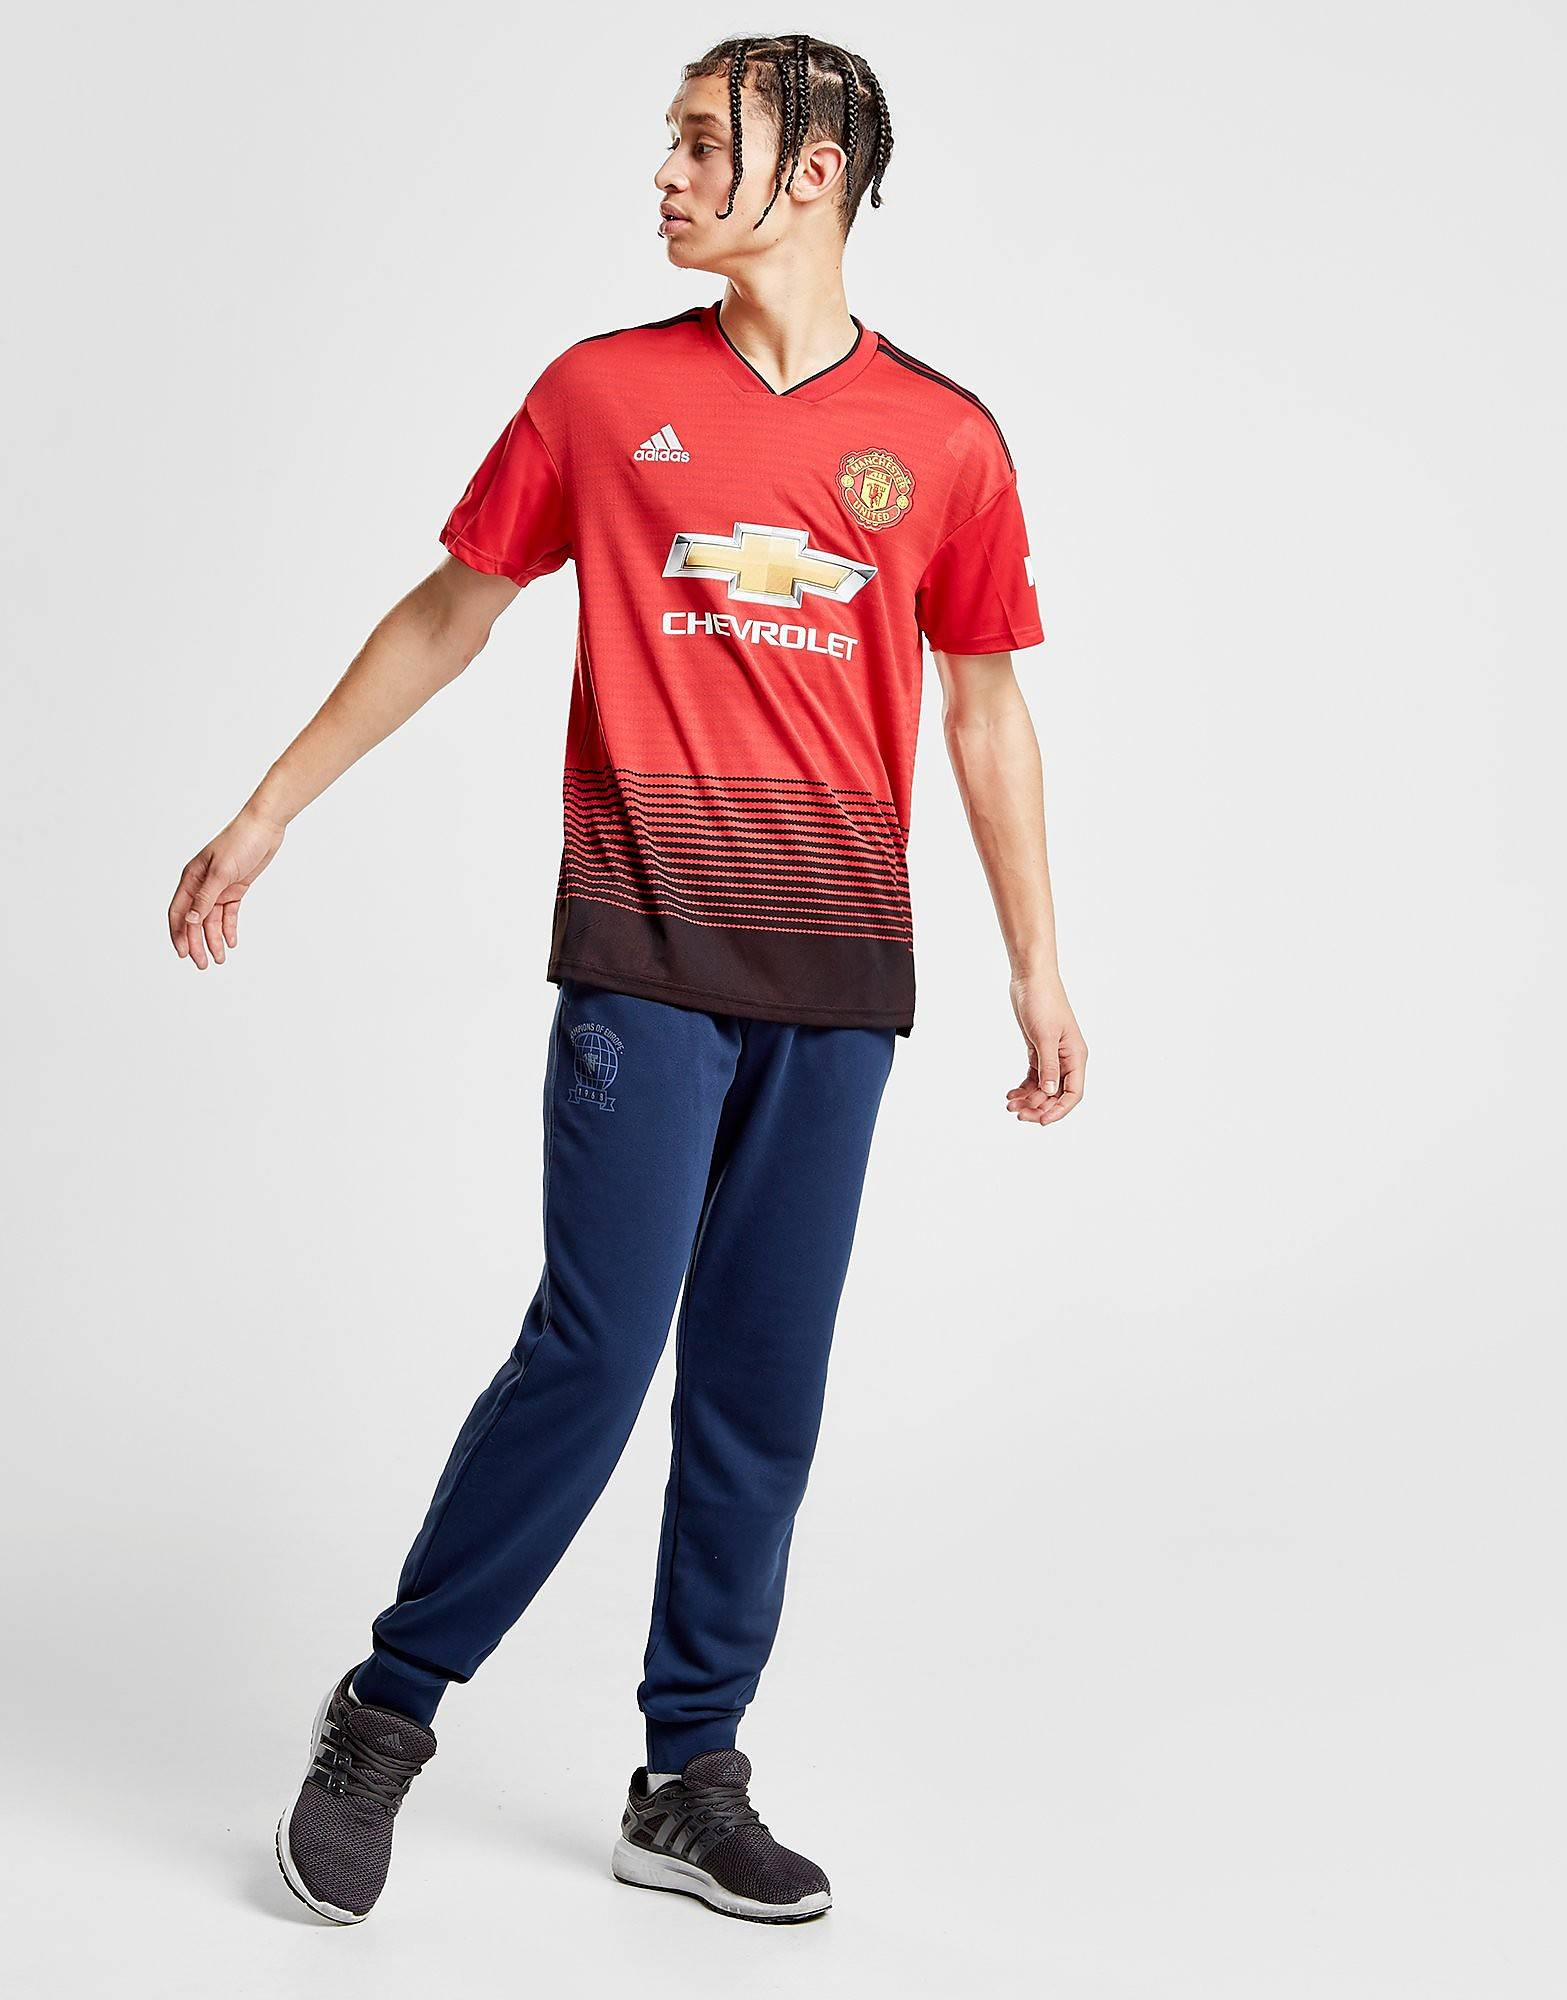 Image of Adidas Manchester United Track Pants - Mens, Laivastonsininen